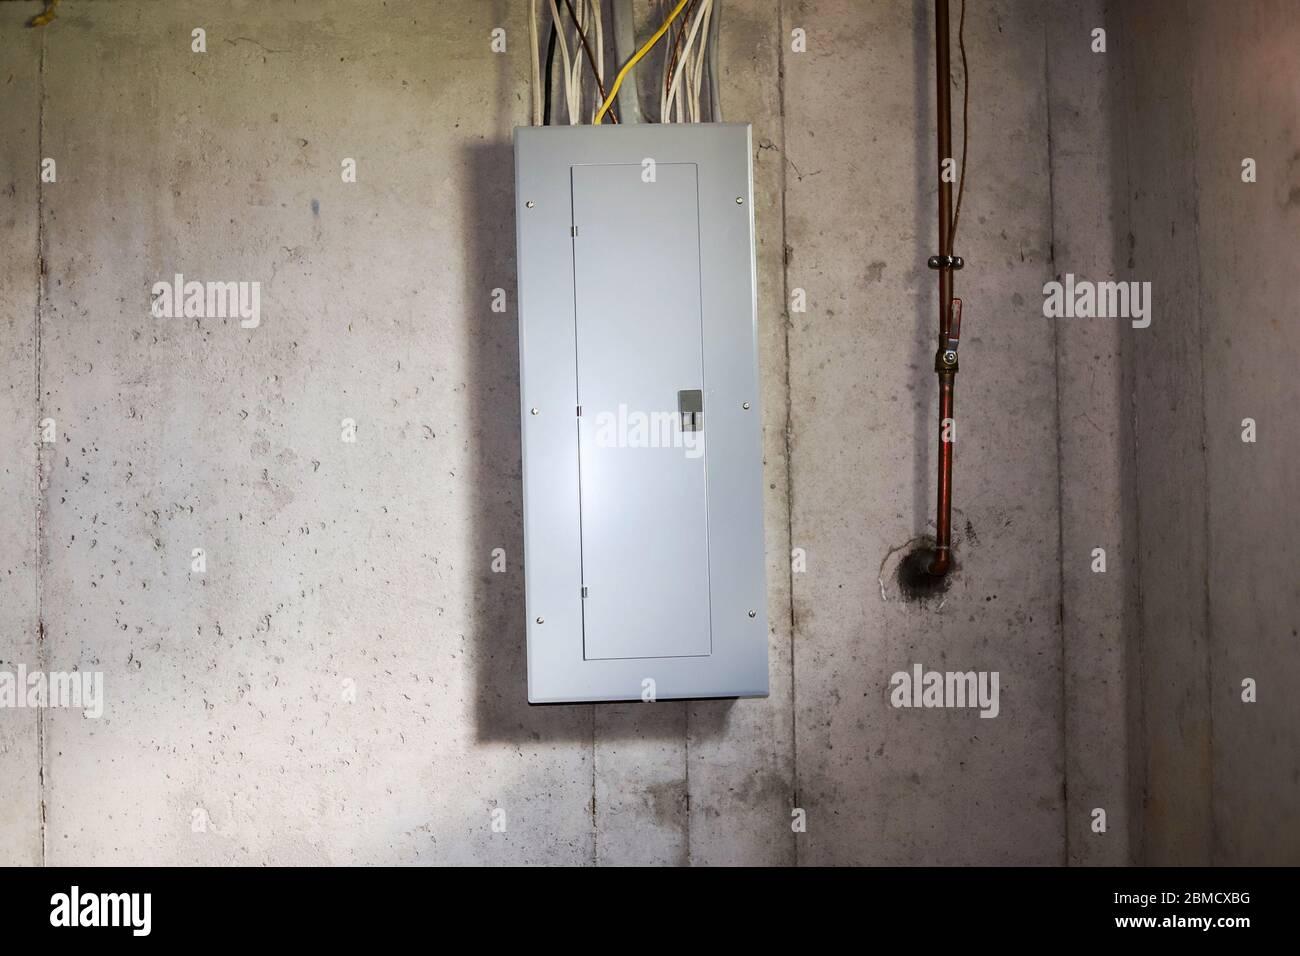 A fuse box in a basement Stock Photo - AlamyAlamy